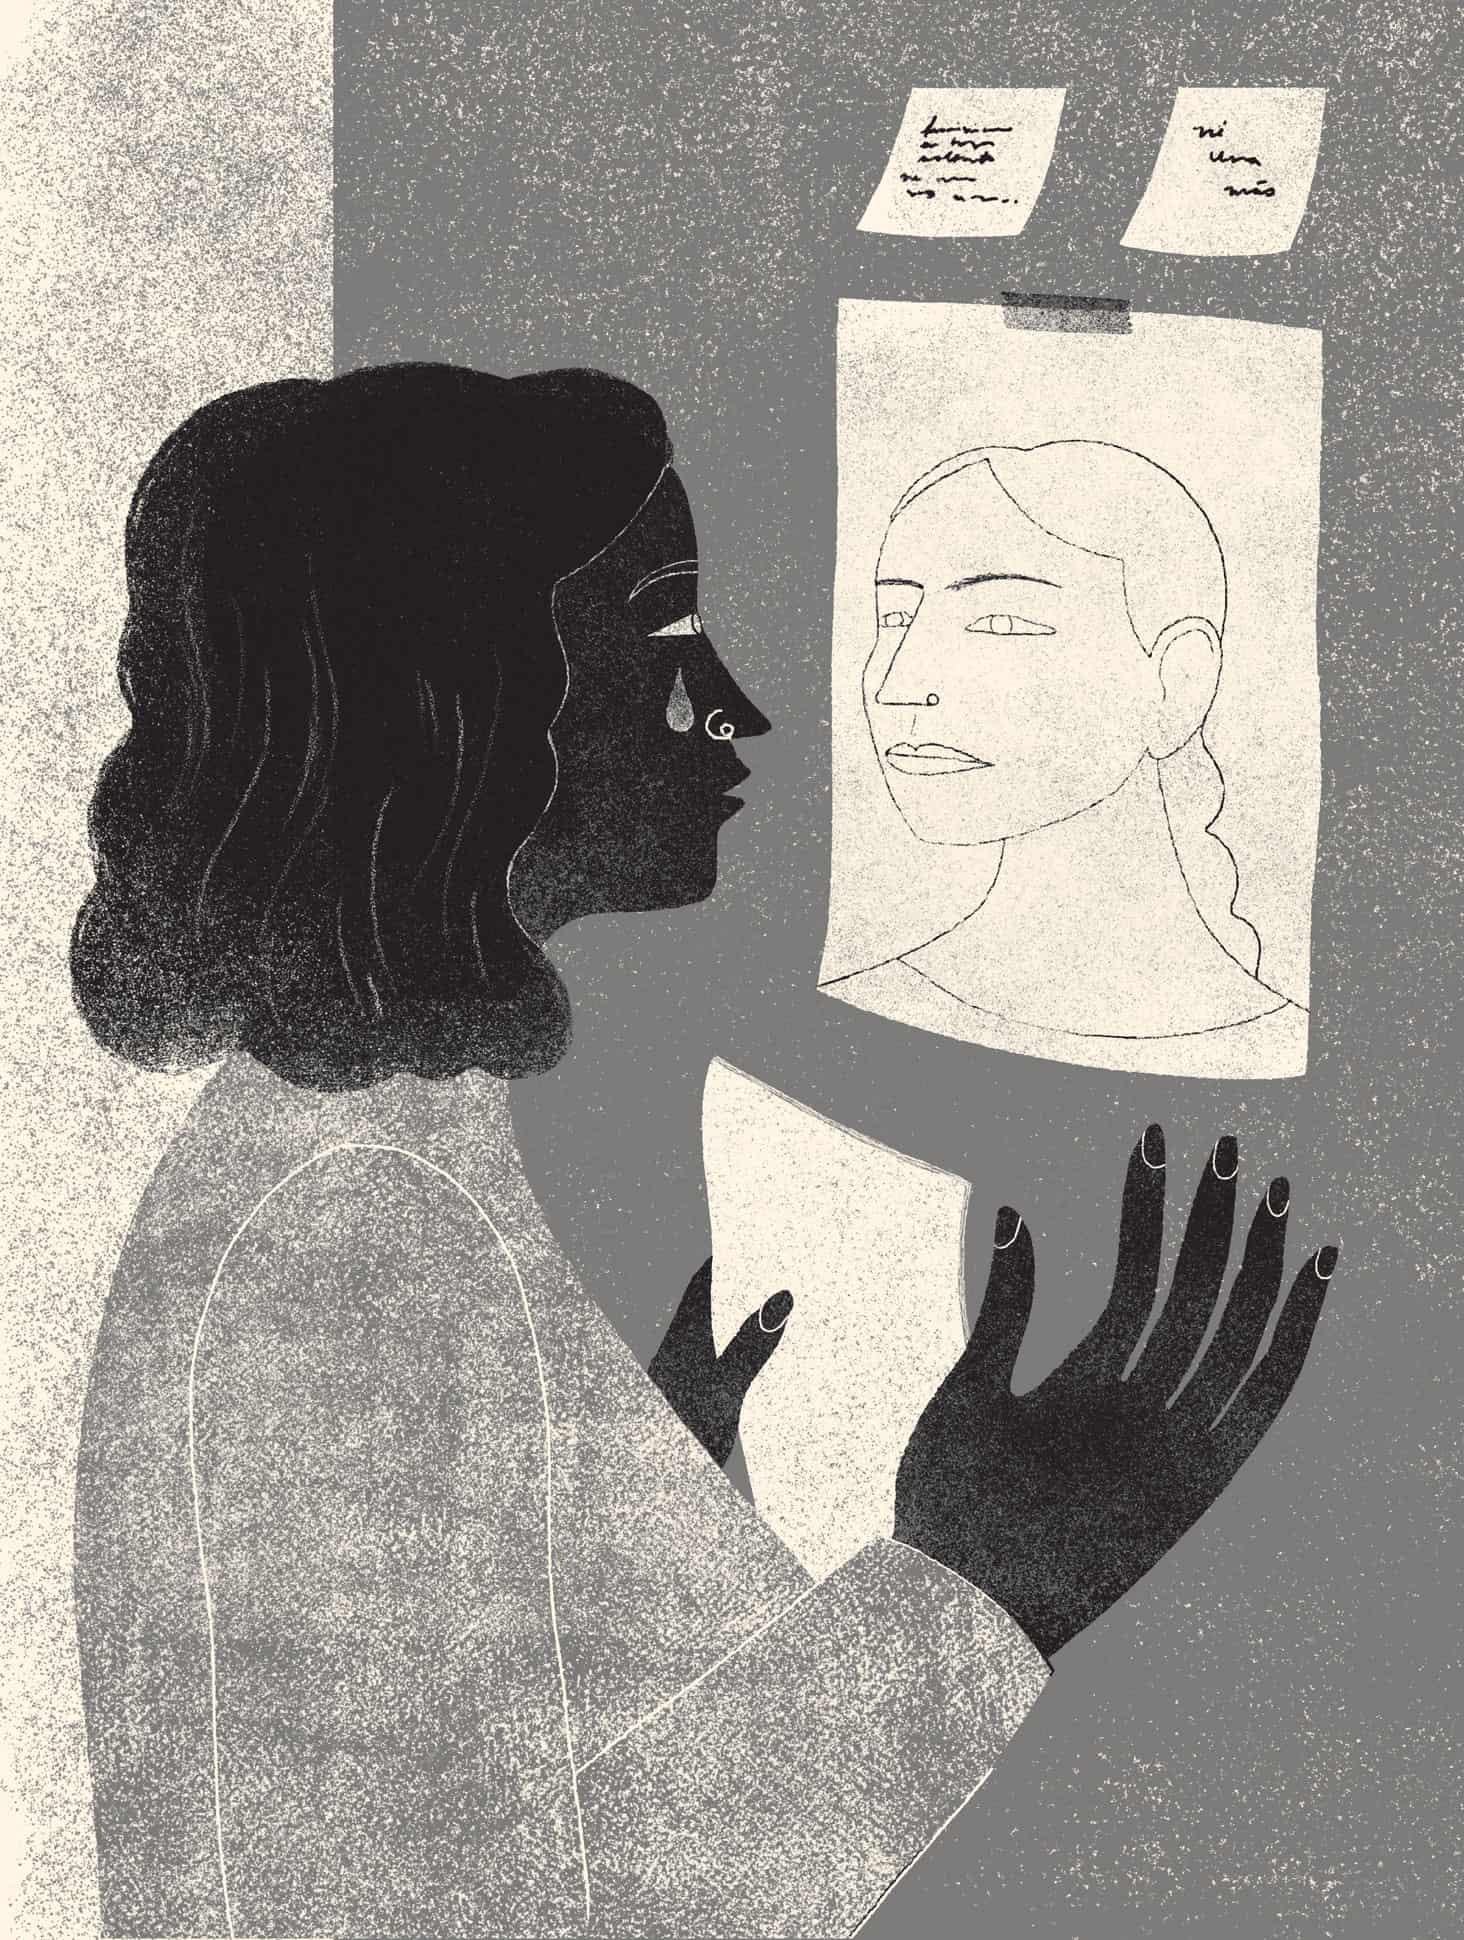 mujeres perito ilustracion de jimena estibaliz